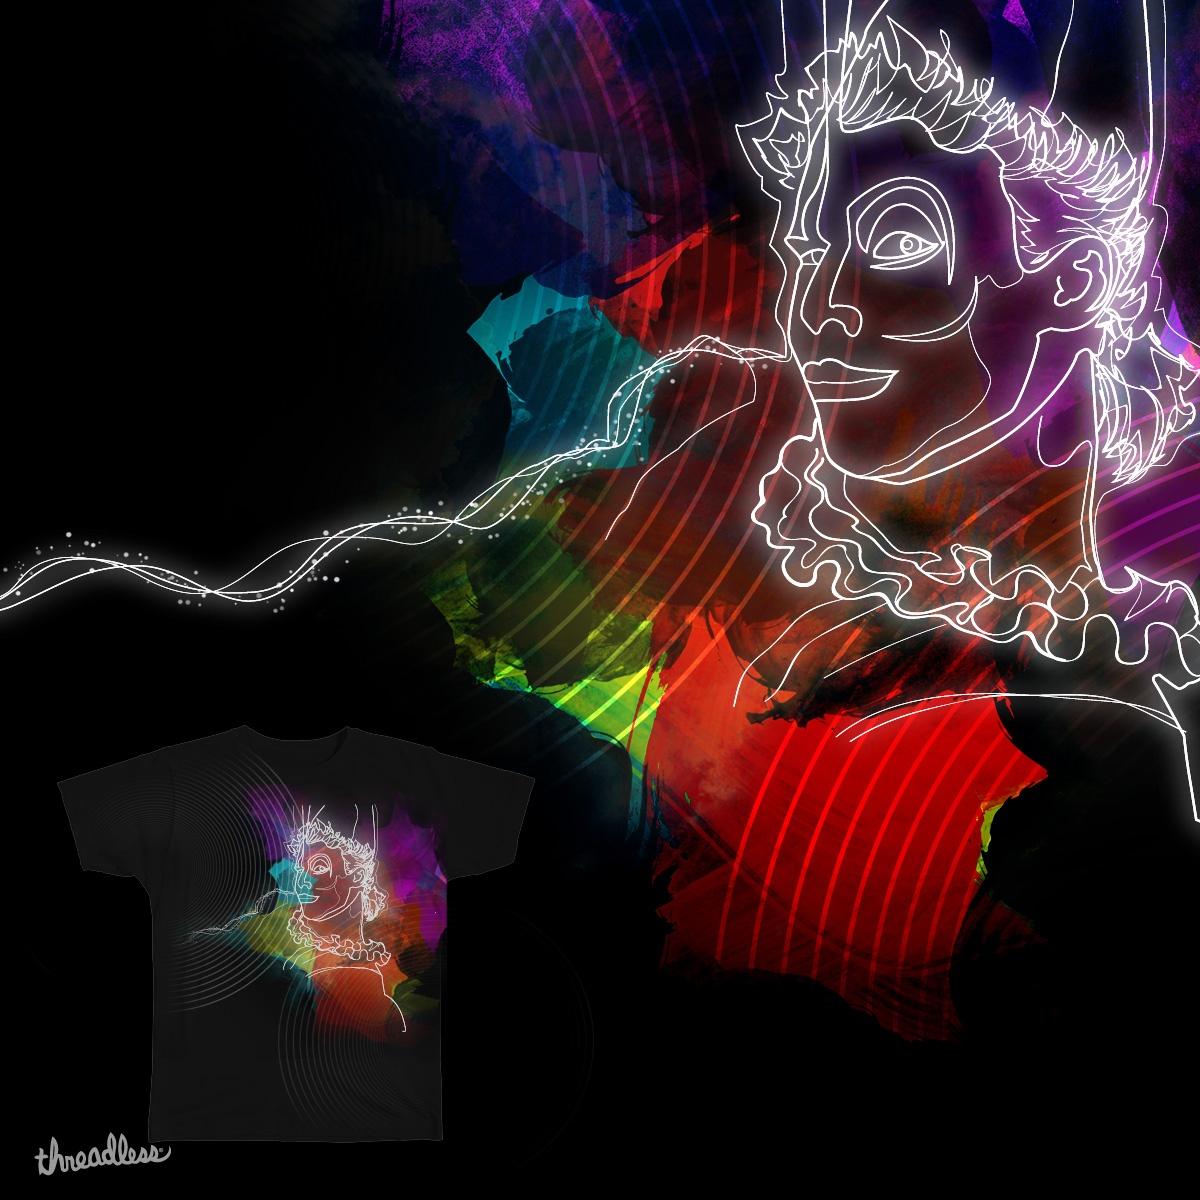 The Joker - Circus of Imagination by rohan.jha.792 on Threadless